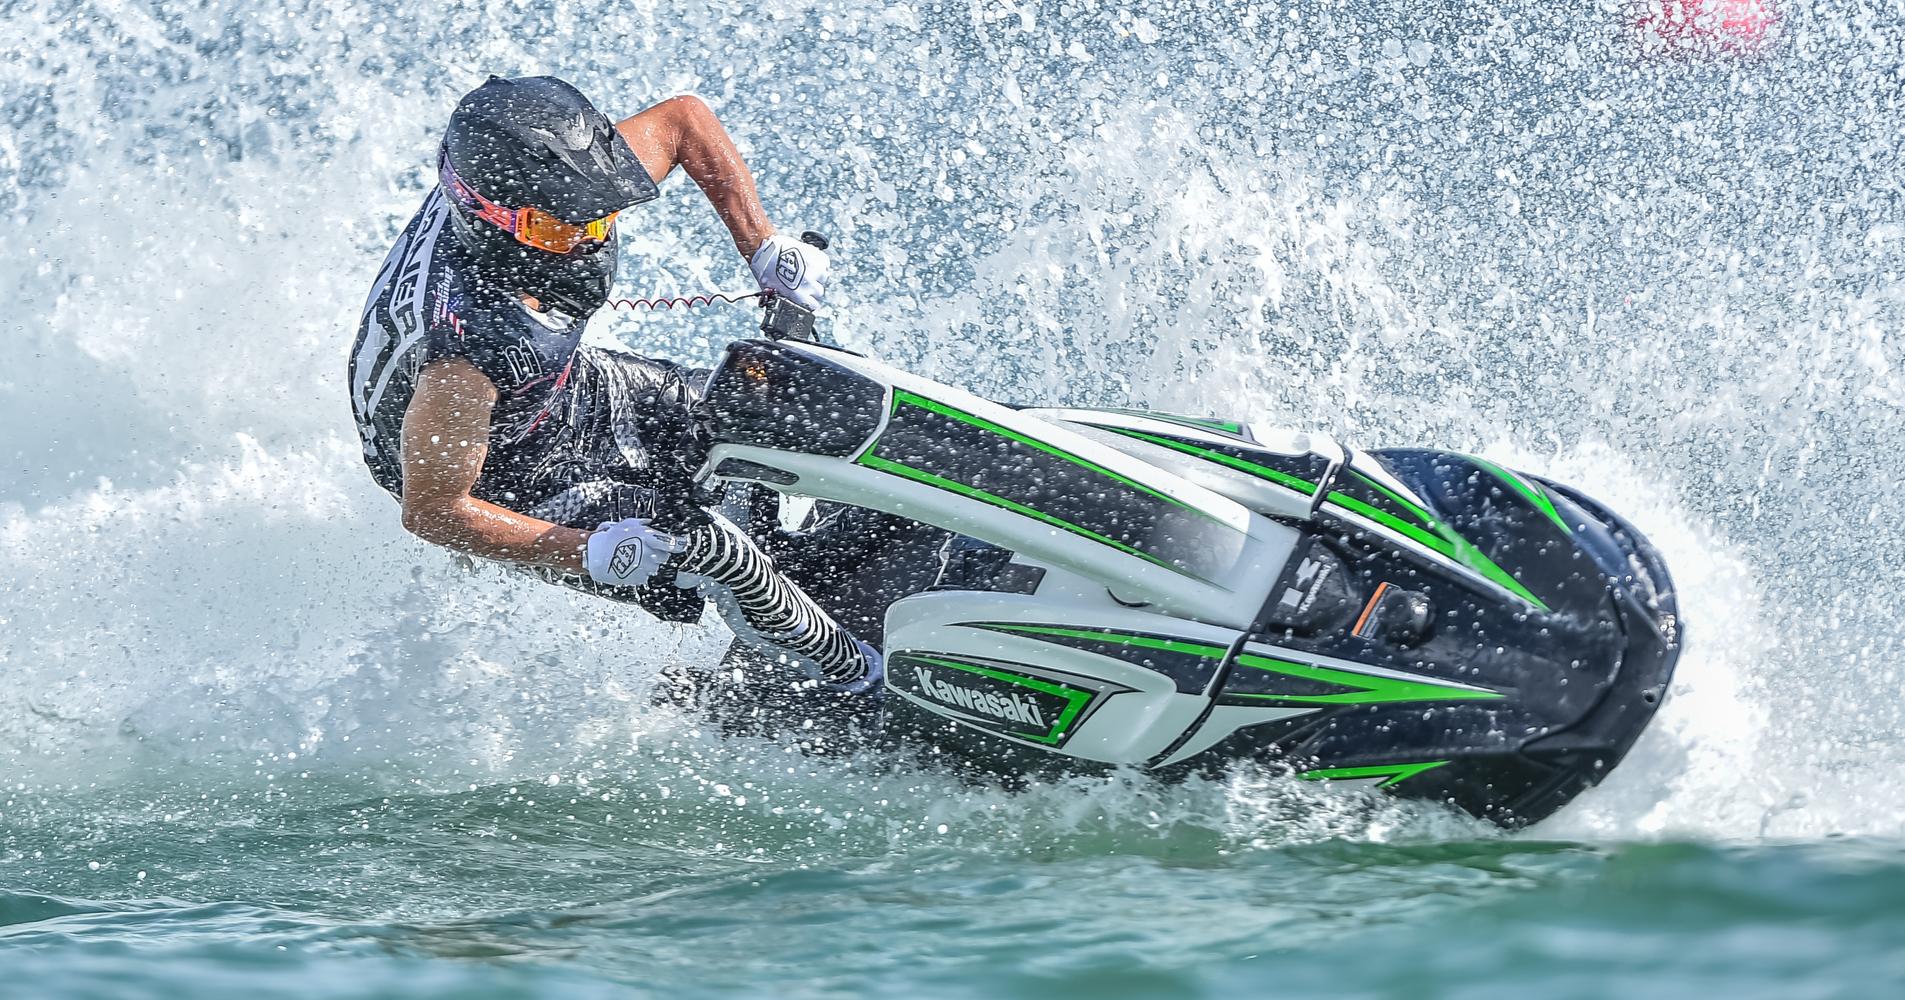 Kawasaki SX-R on show in Ft Lauderdale finale - P1 AquaX